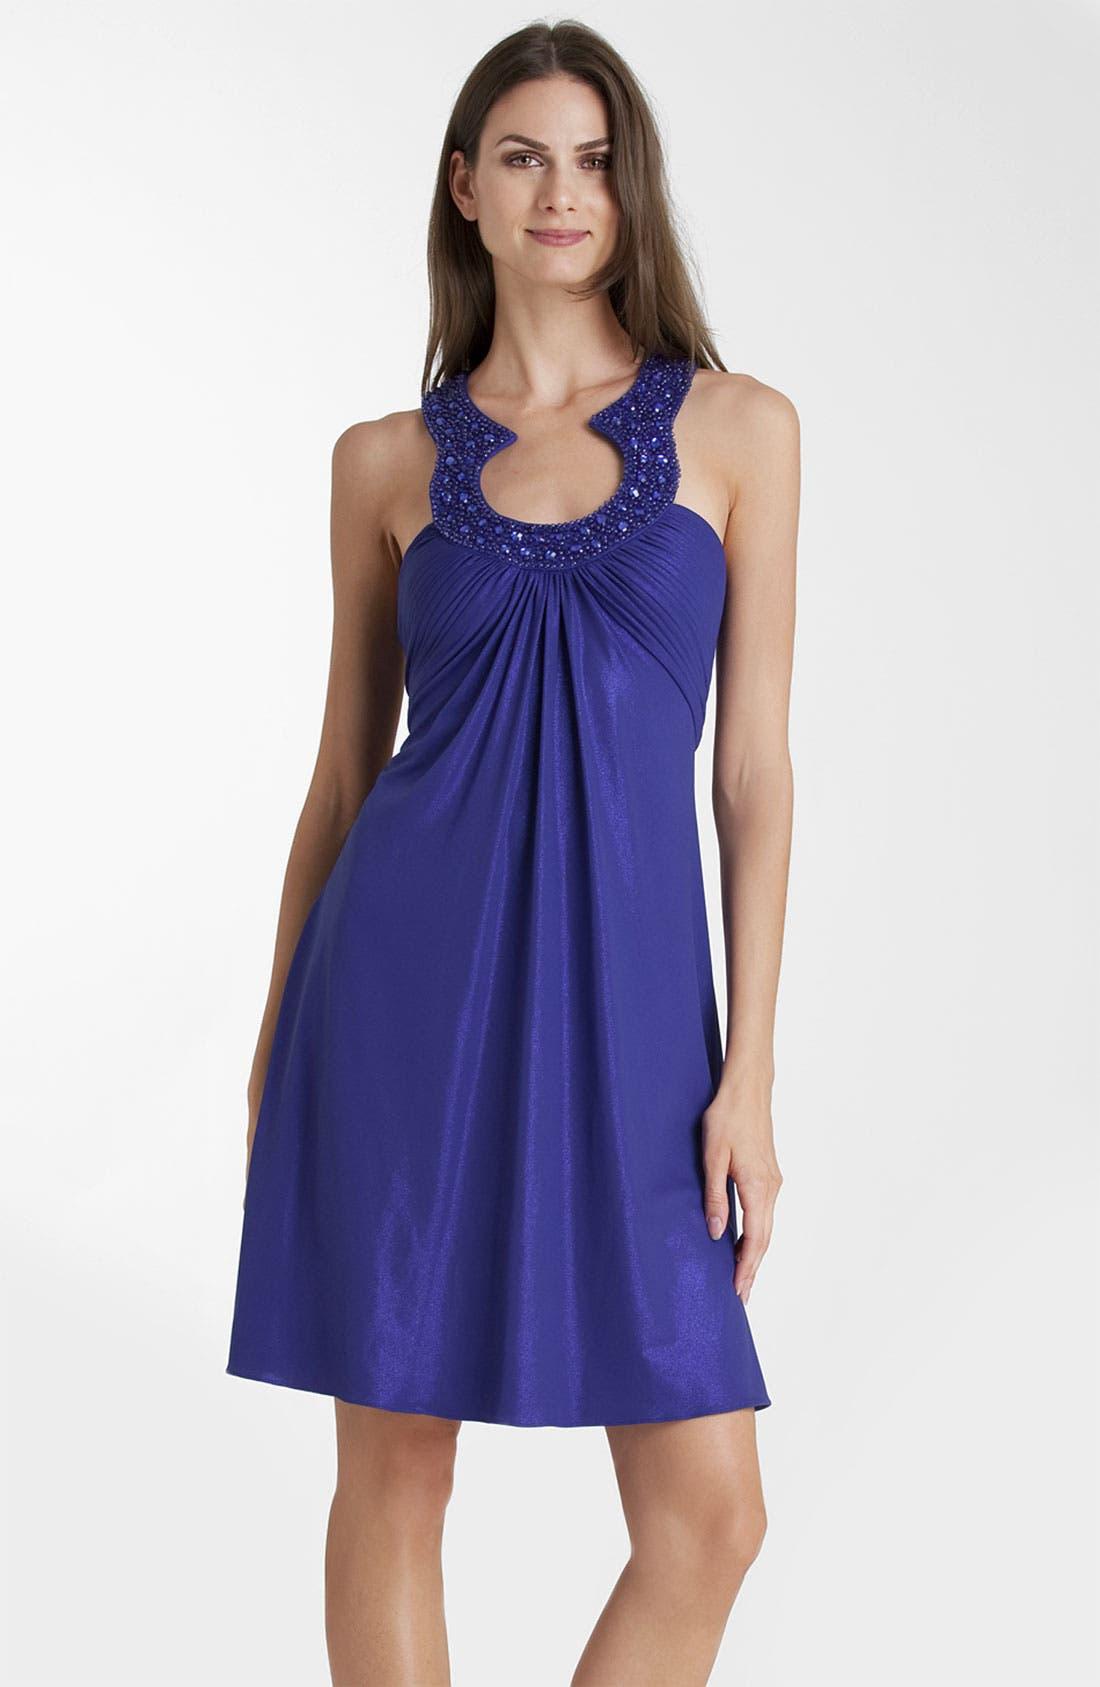 Alternate Image 1 Selected - JS Boutique Beaded Collar Shift Dress (Petite)